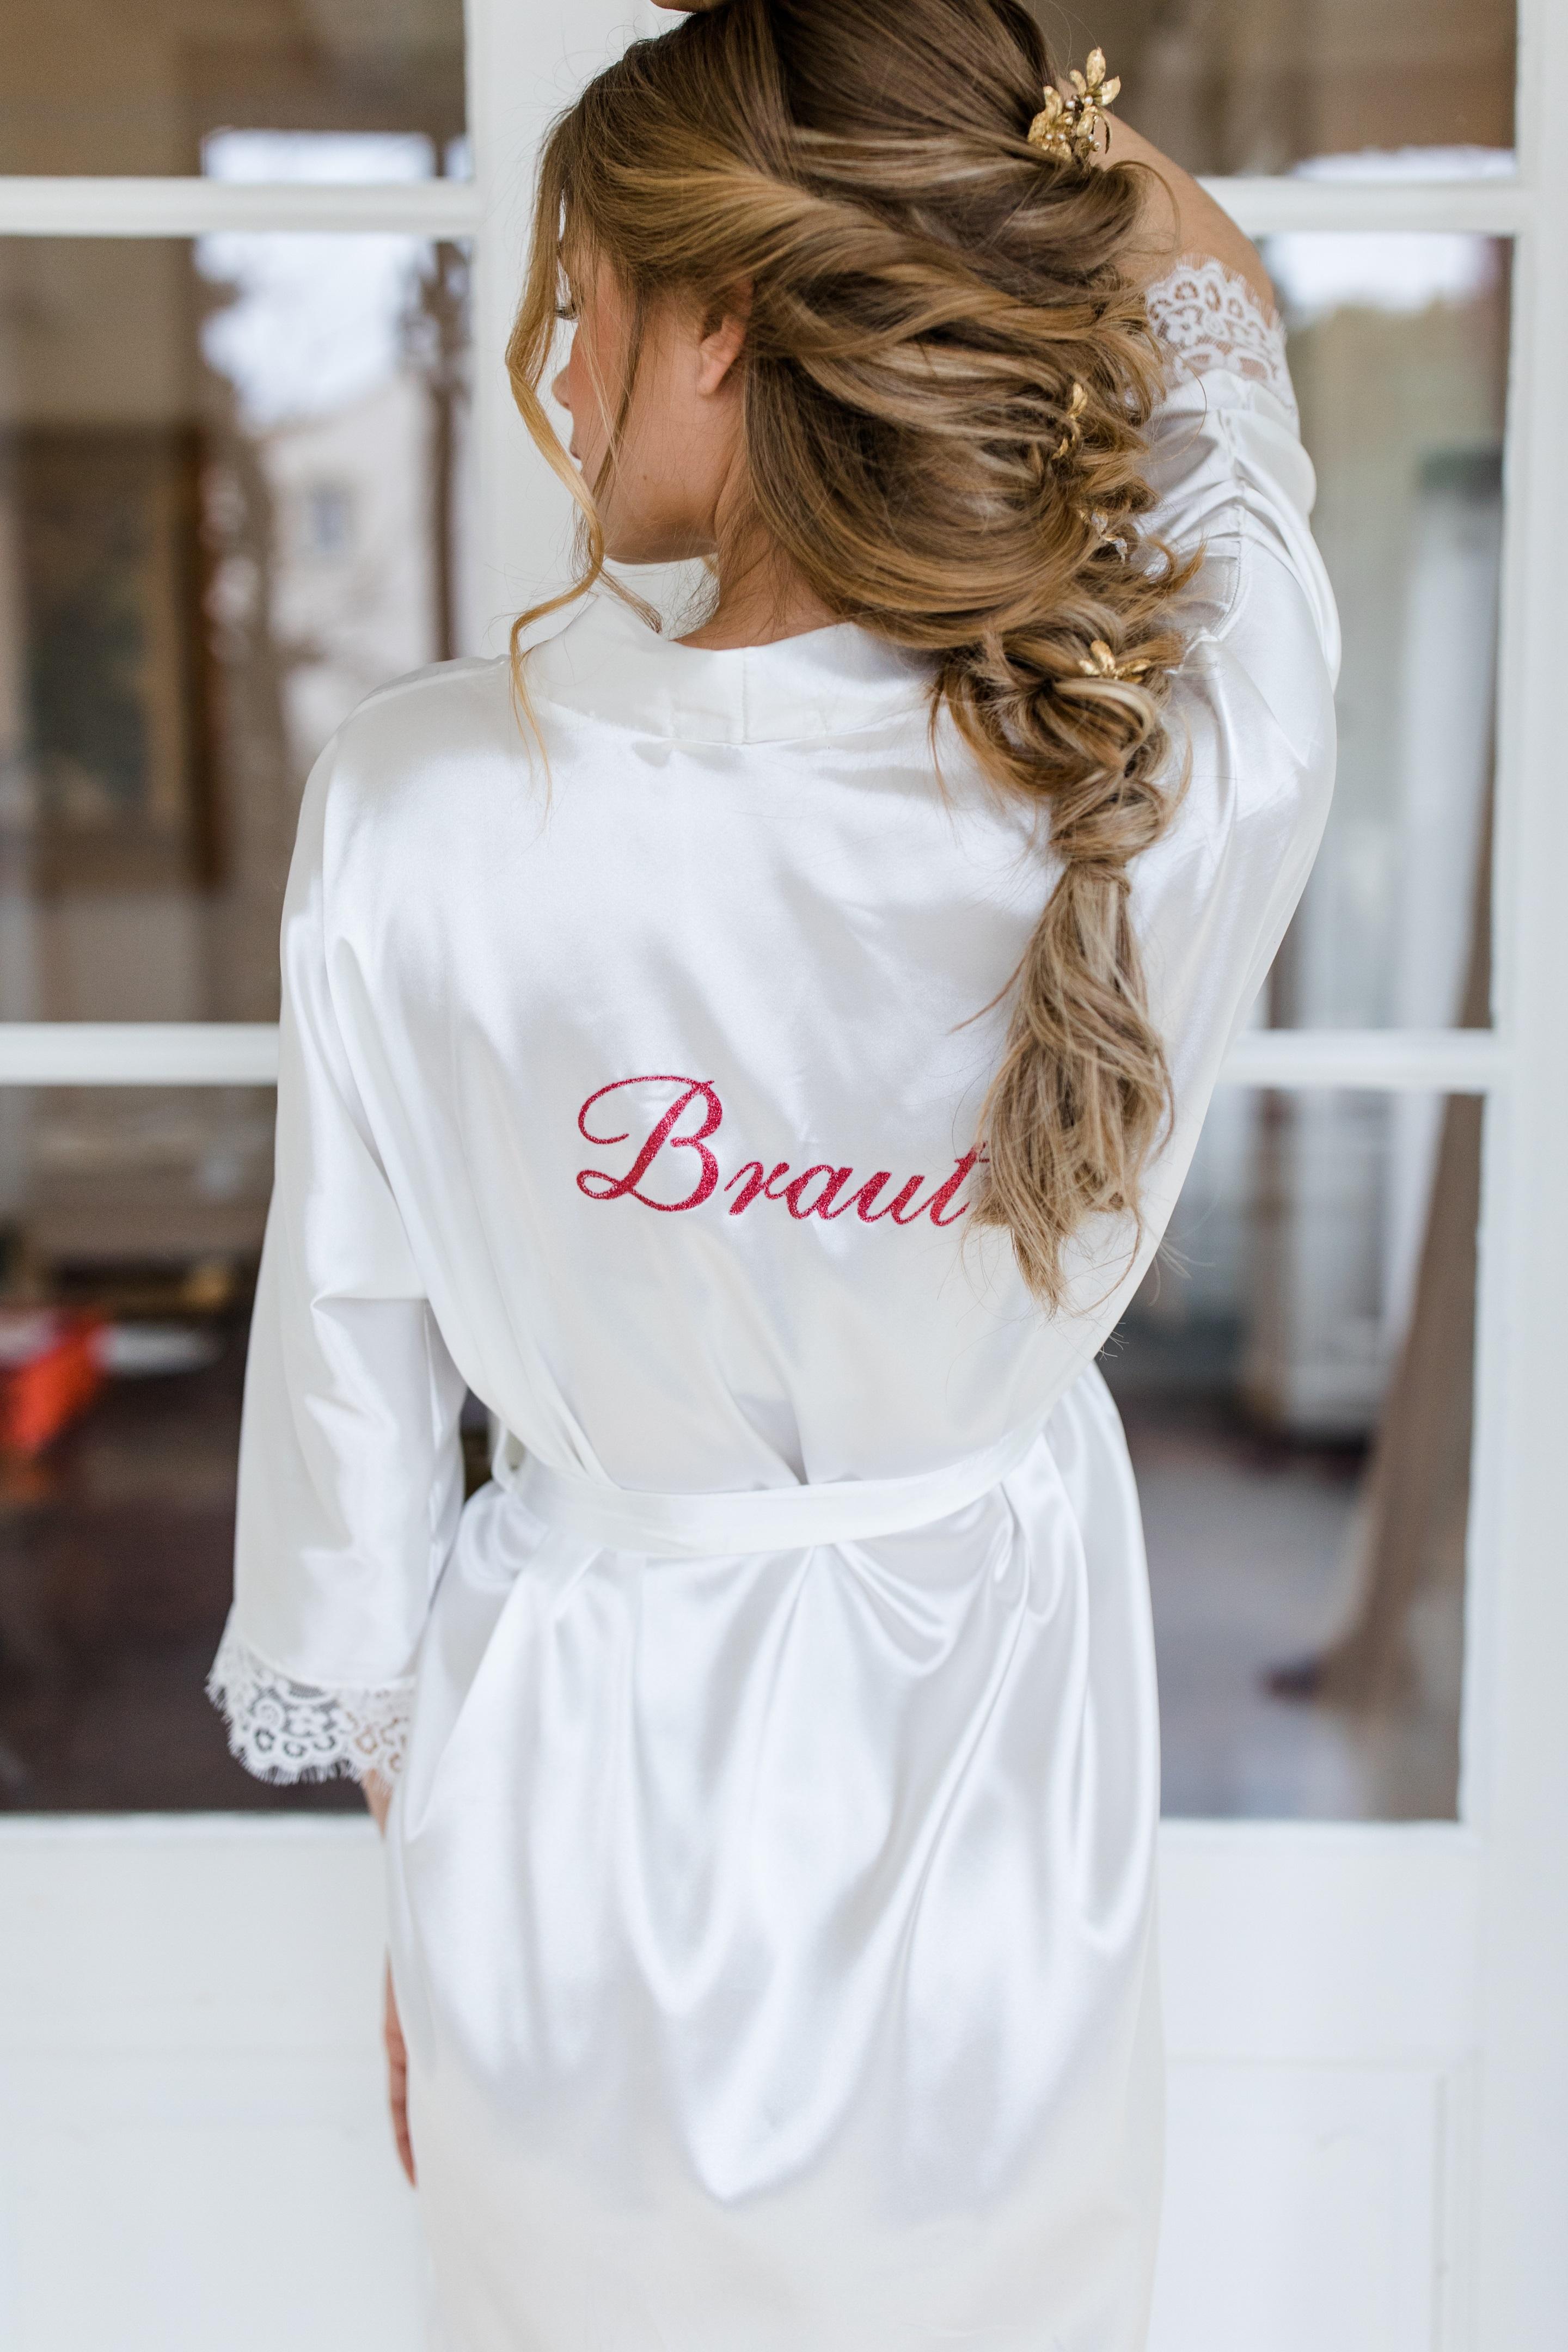 Braut Bride getting ready Morgenmantel Kimono Satin weiß